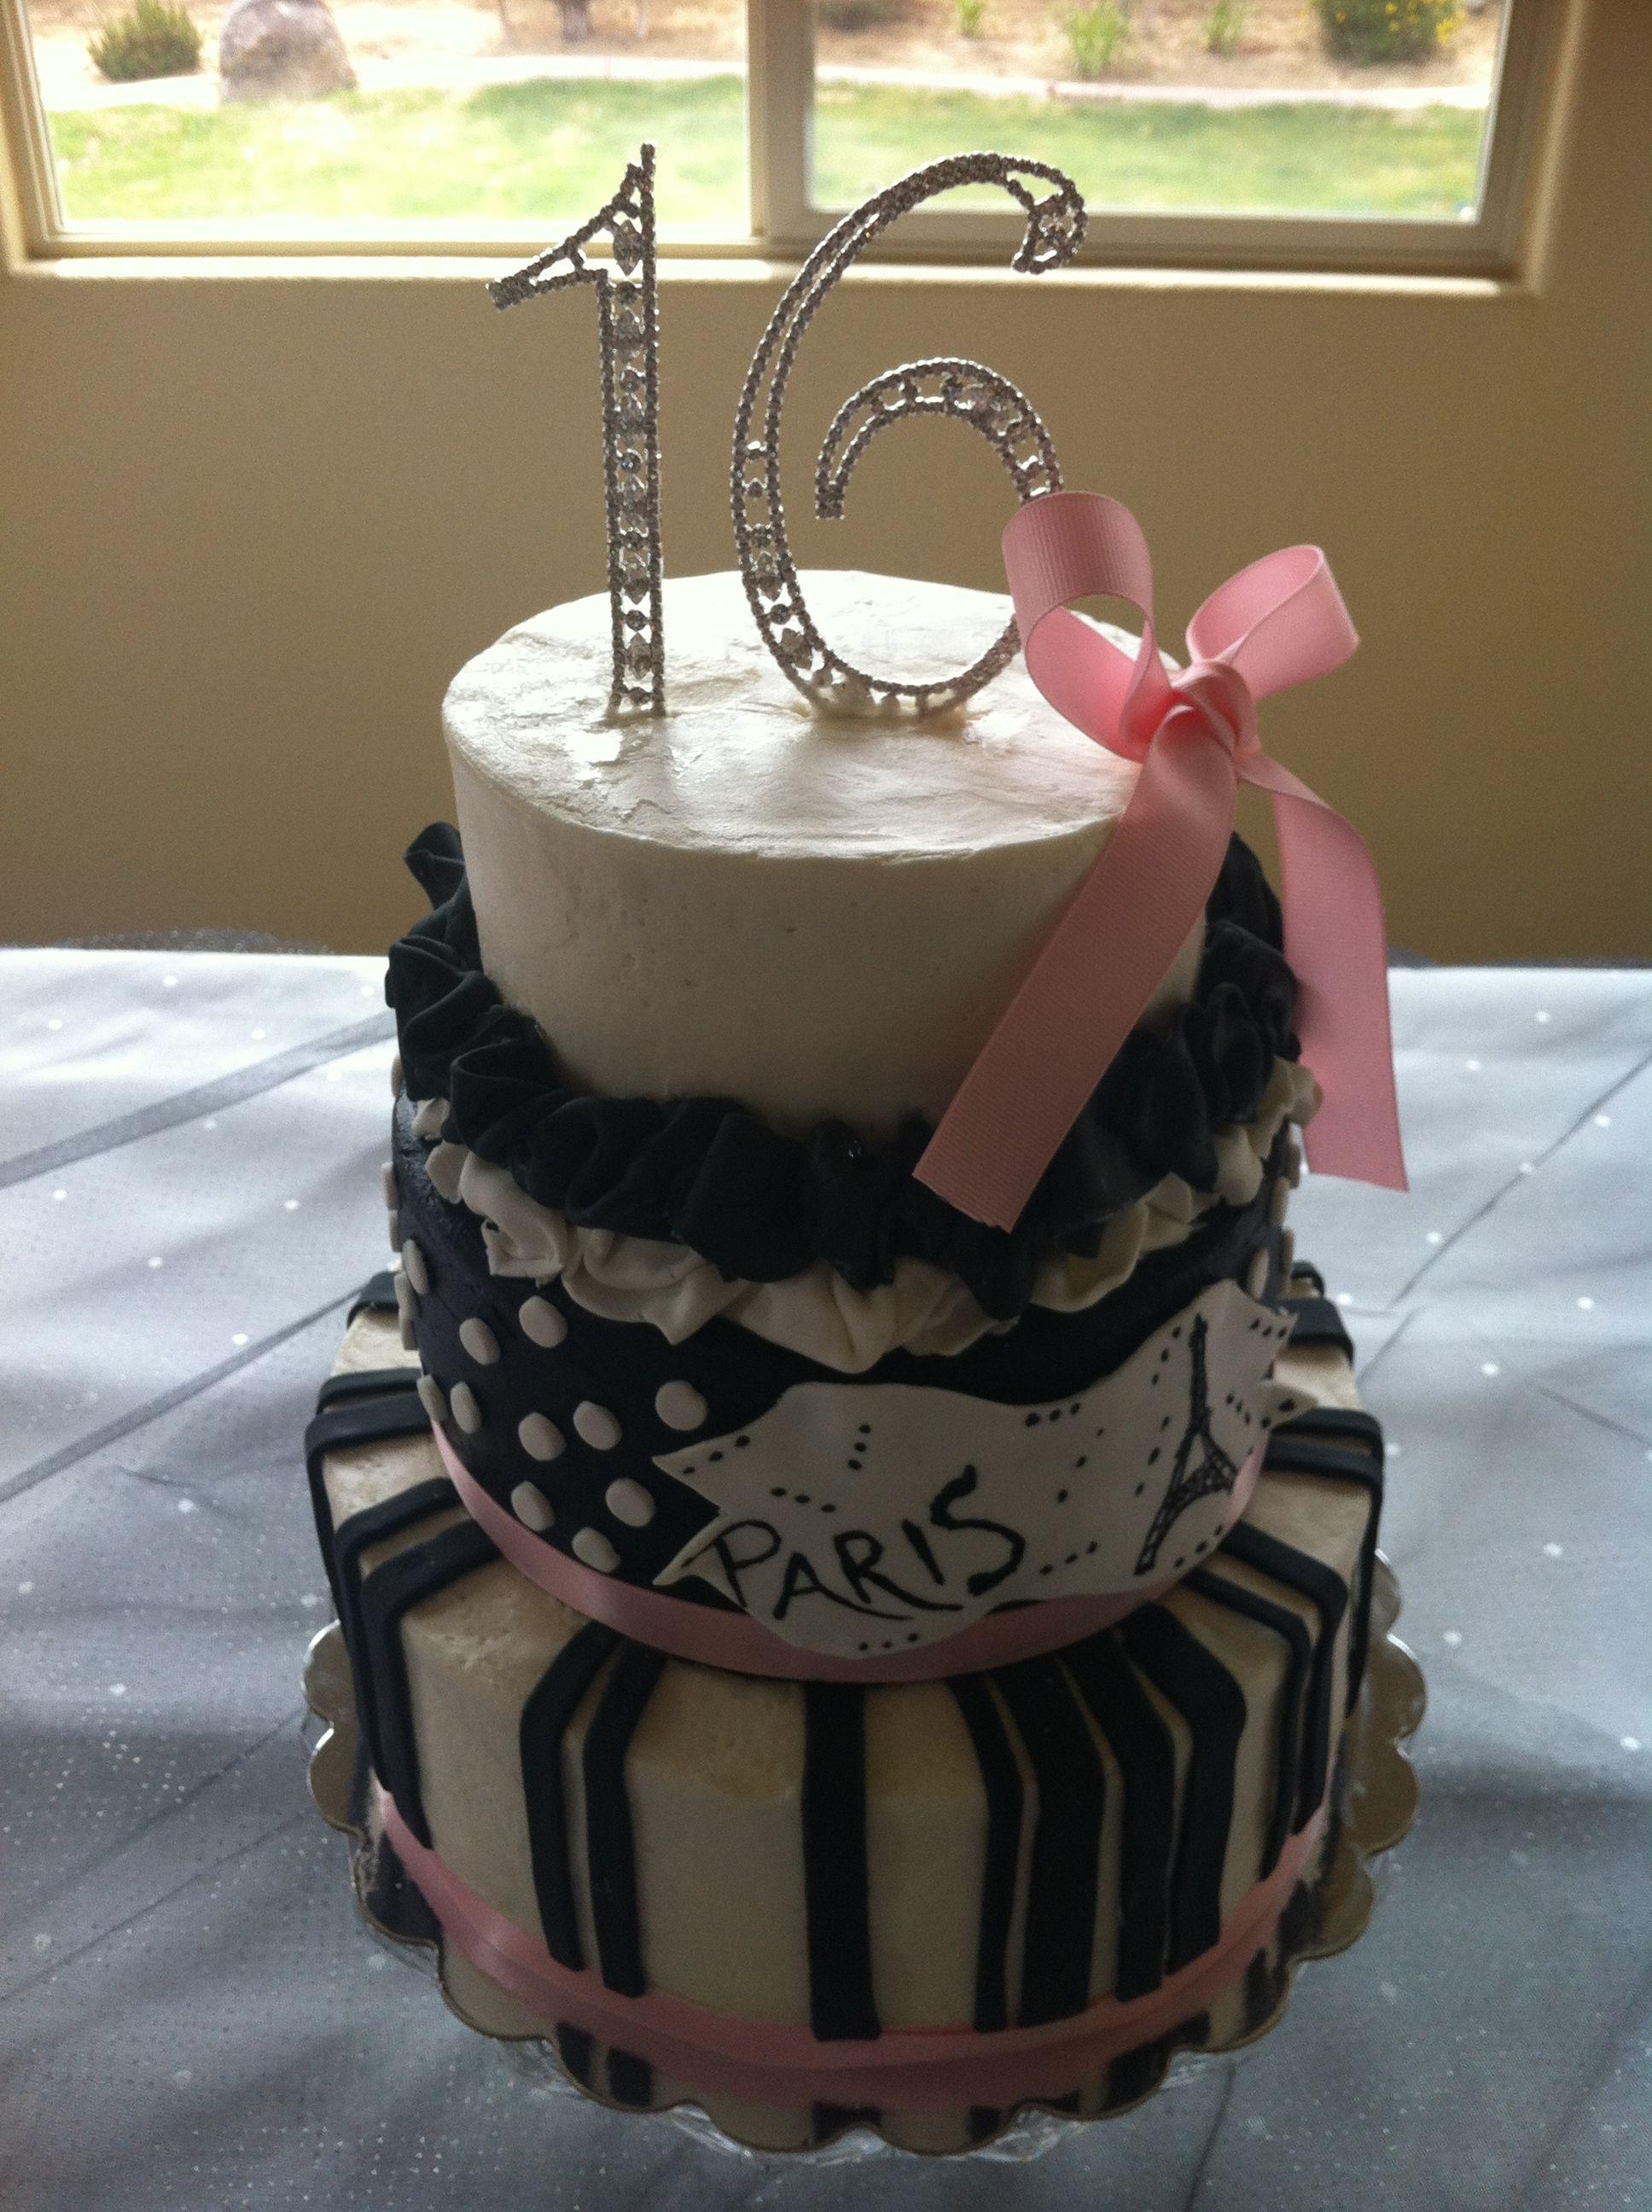 Fantastic Sweet 16 Cake Cake By Tiers Of Joy Wedding Cake In Reno Nv Birthday Cards Printable Opercafe Filternl